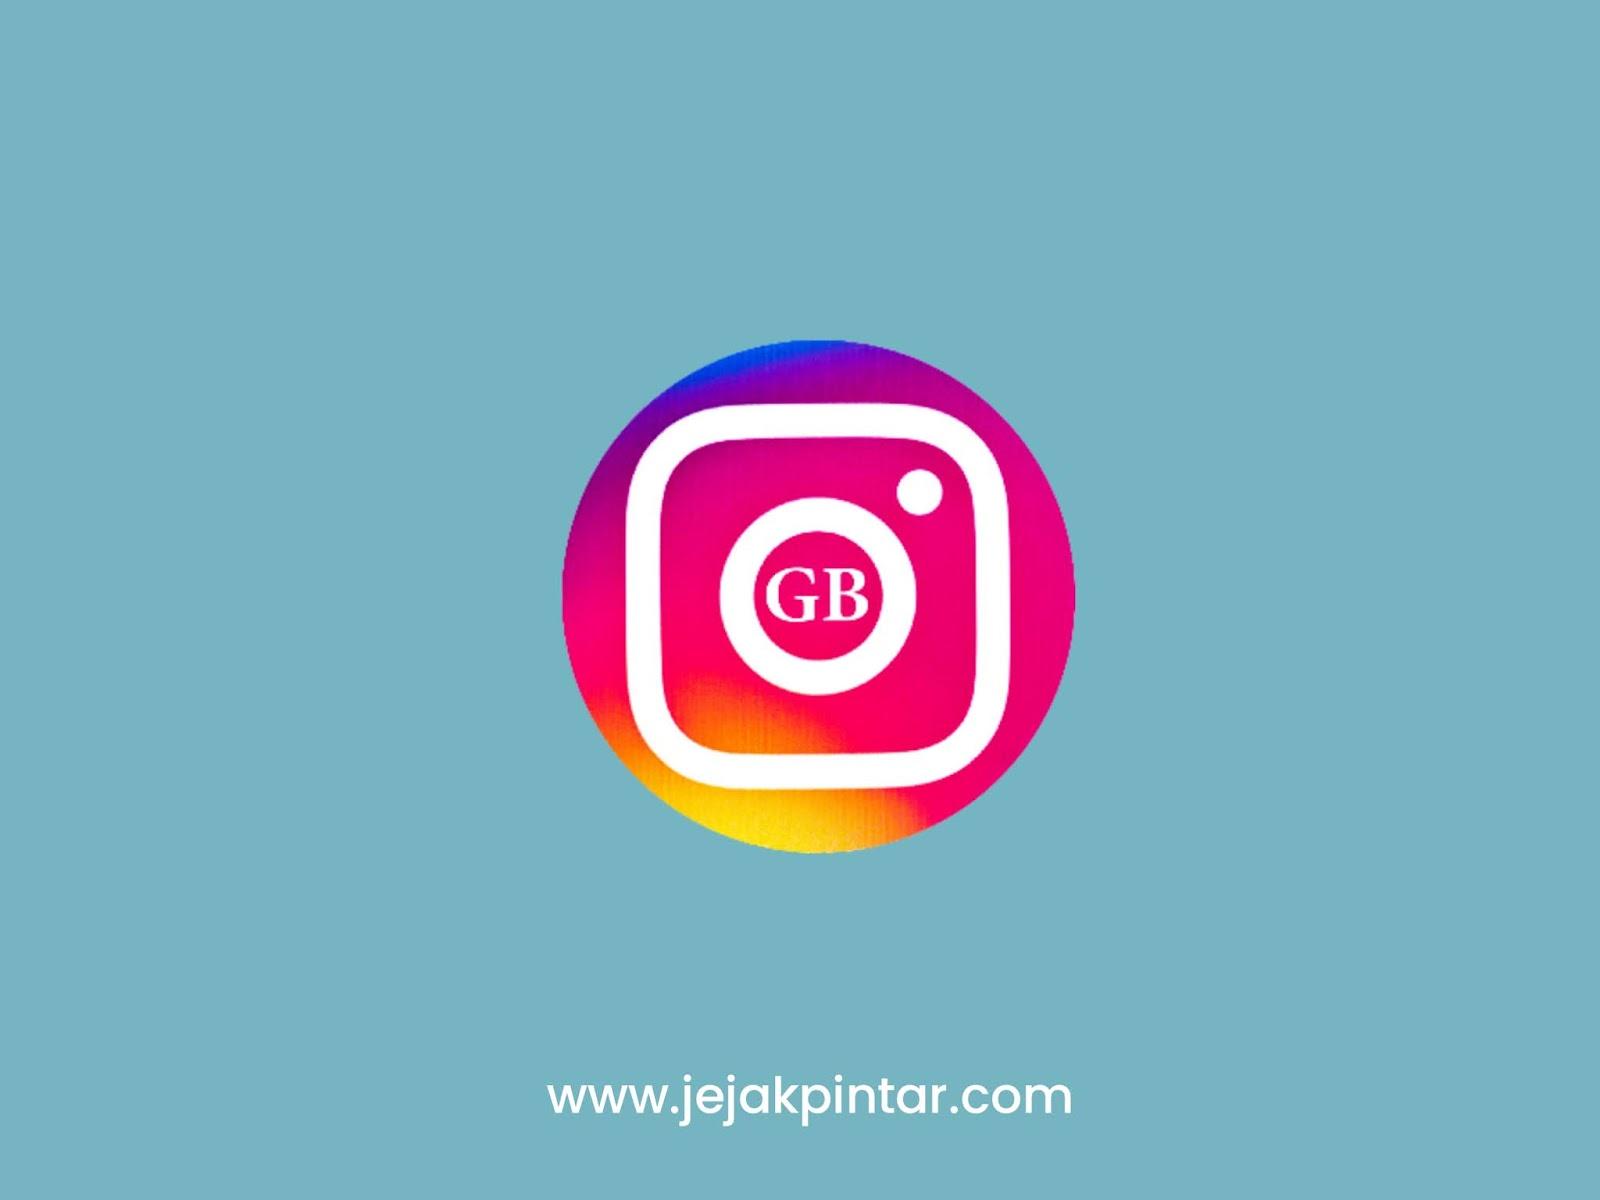 Download aplikasi GB Instagram (GBInsta) APK terbaru 2020